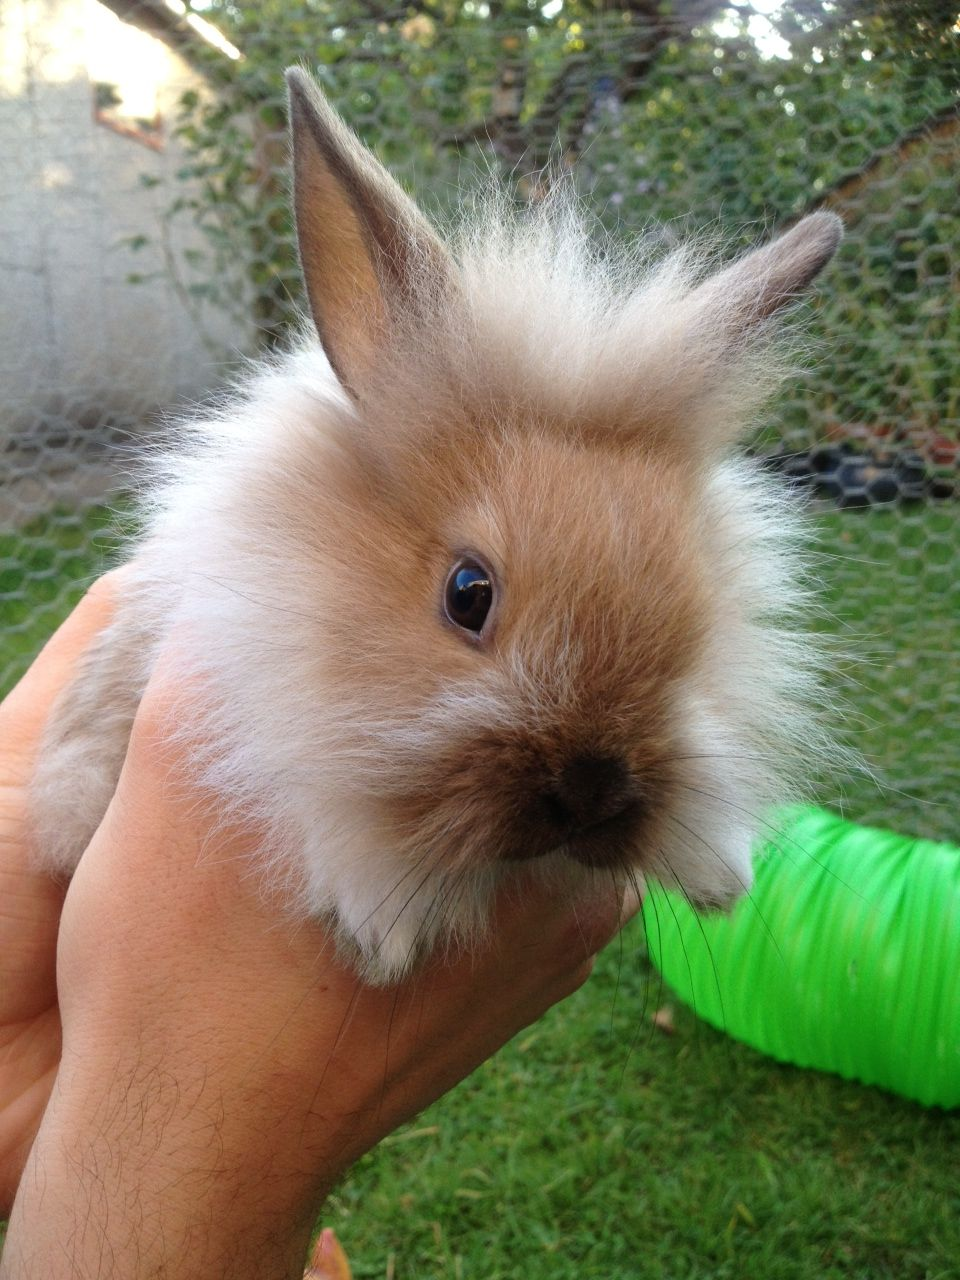 Baby Dwarf Lionhead Rabbits Sale : dwarf, lionhead, rabbits, Tonya, Rabbits, Lionhead, Rabbit,, Bunnies,, Bunny